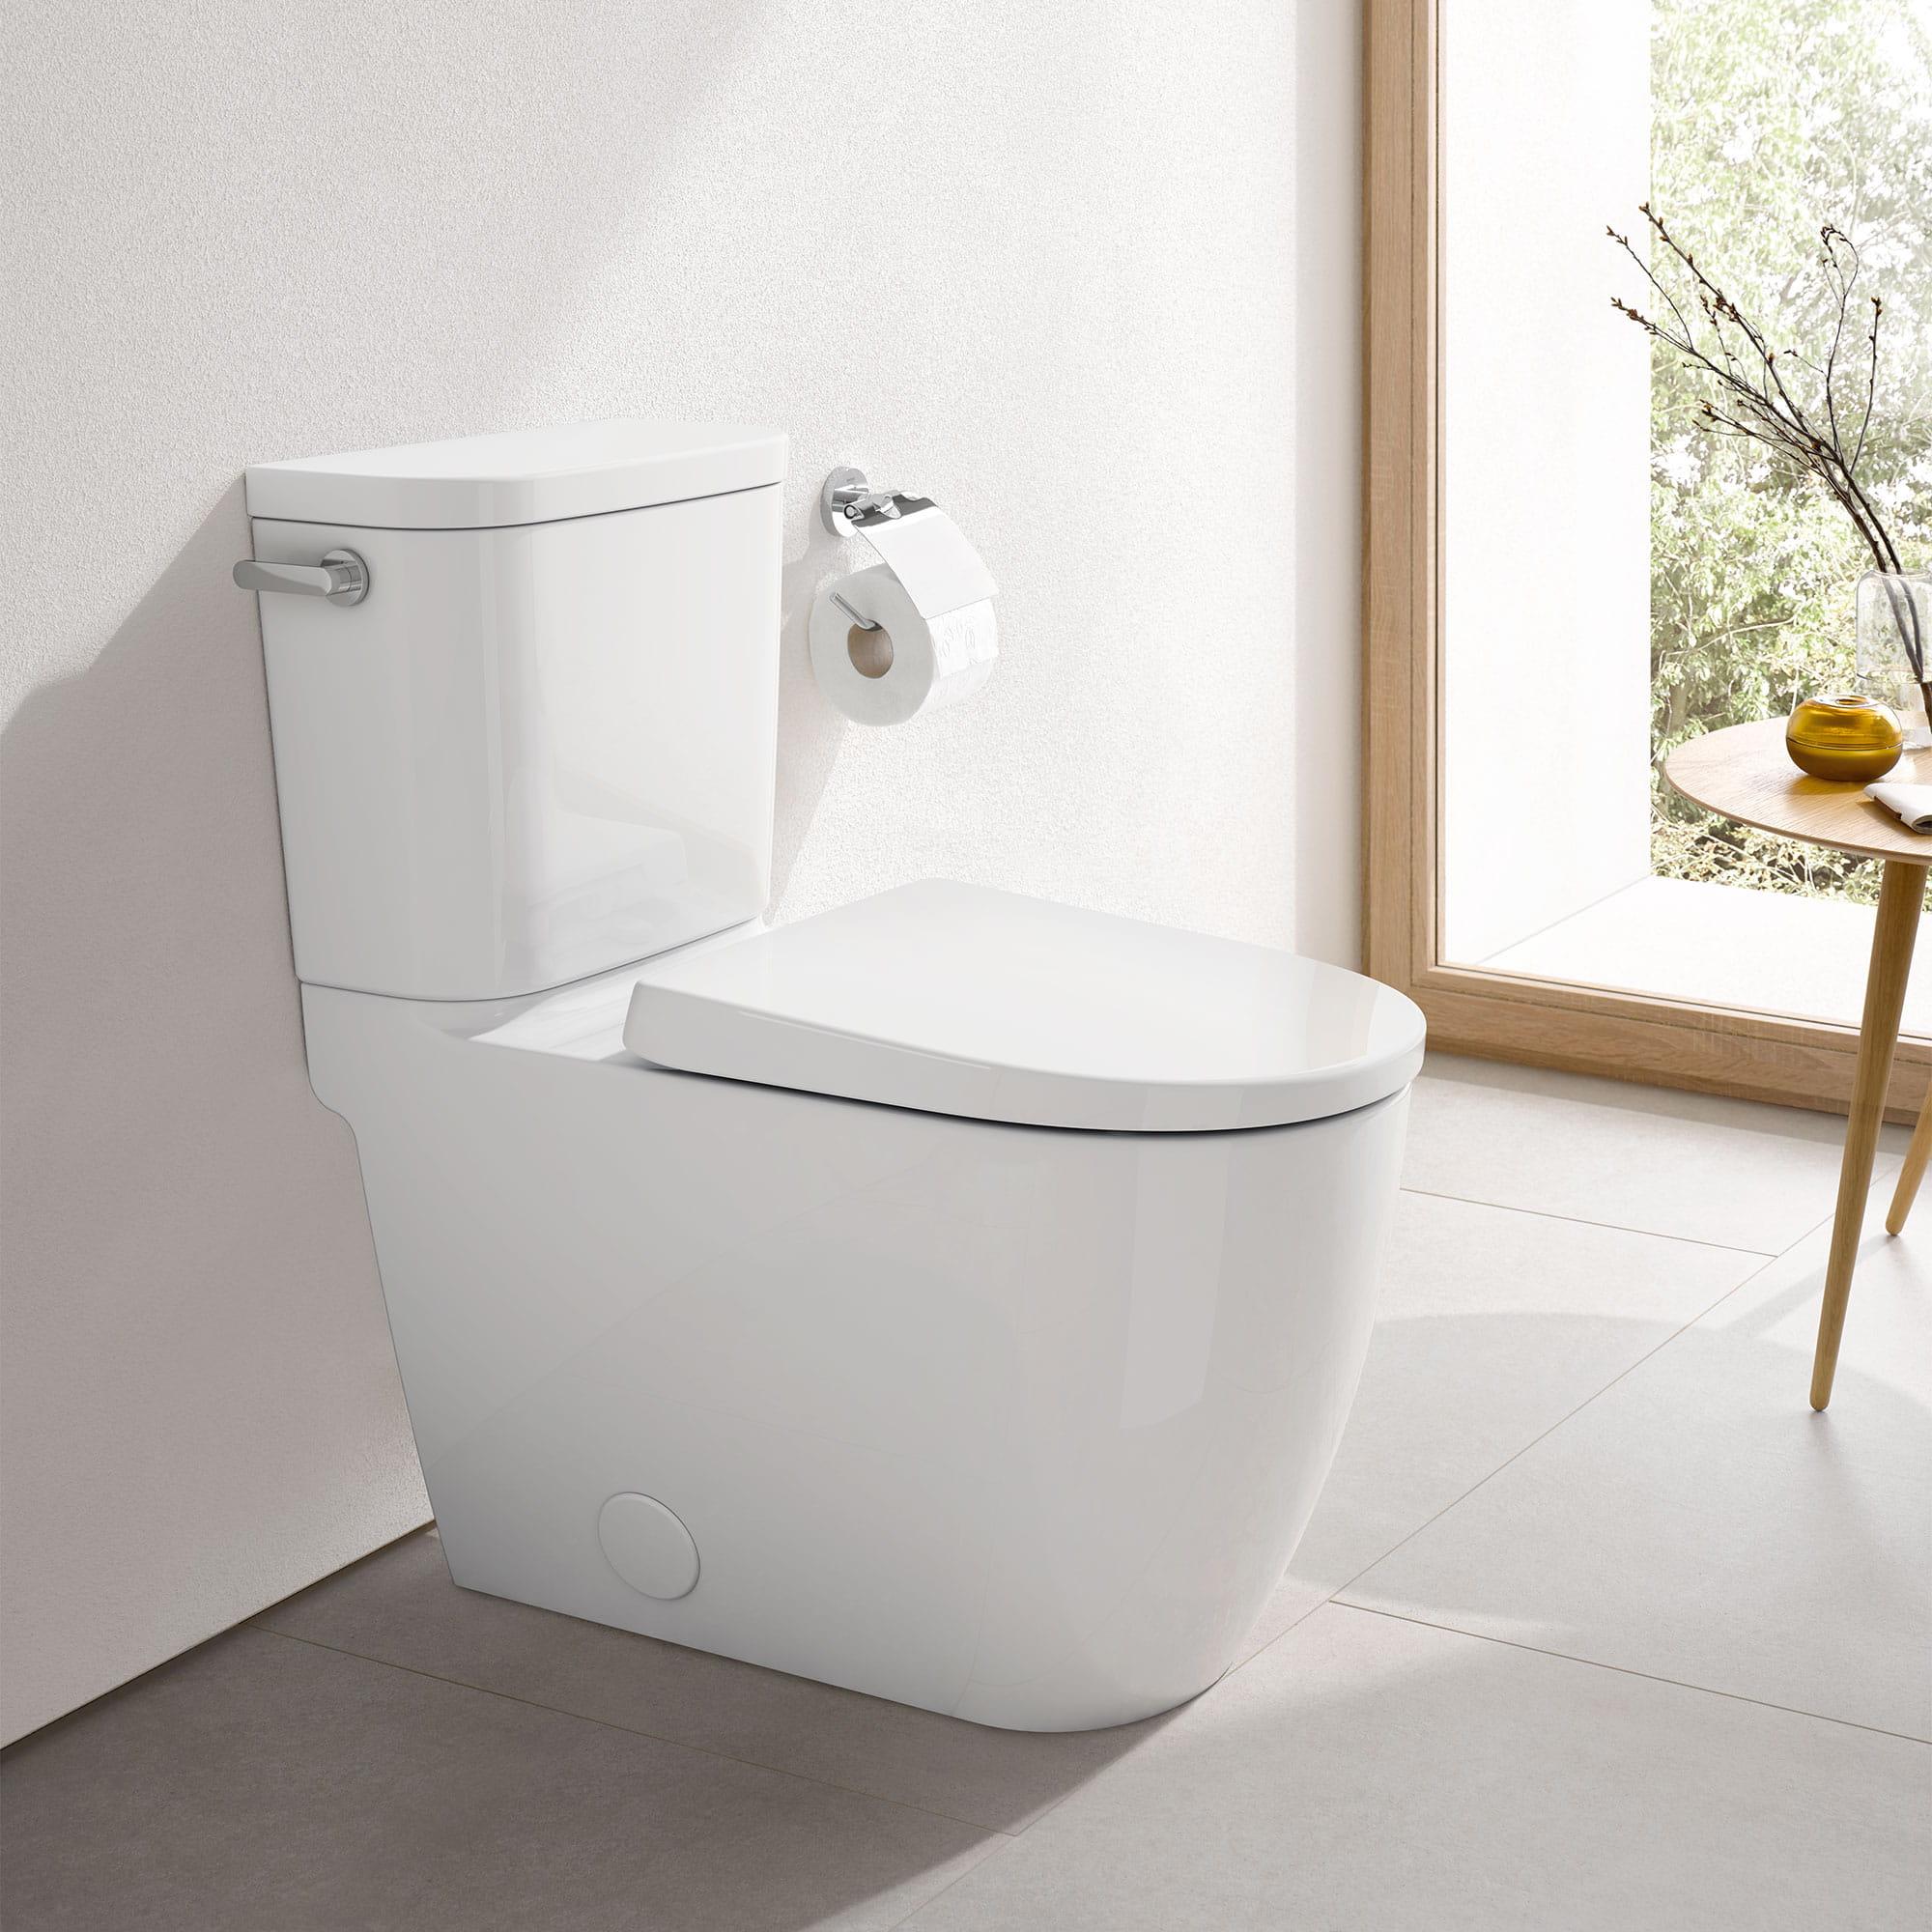 Essence Toilet